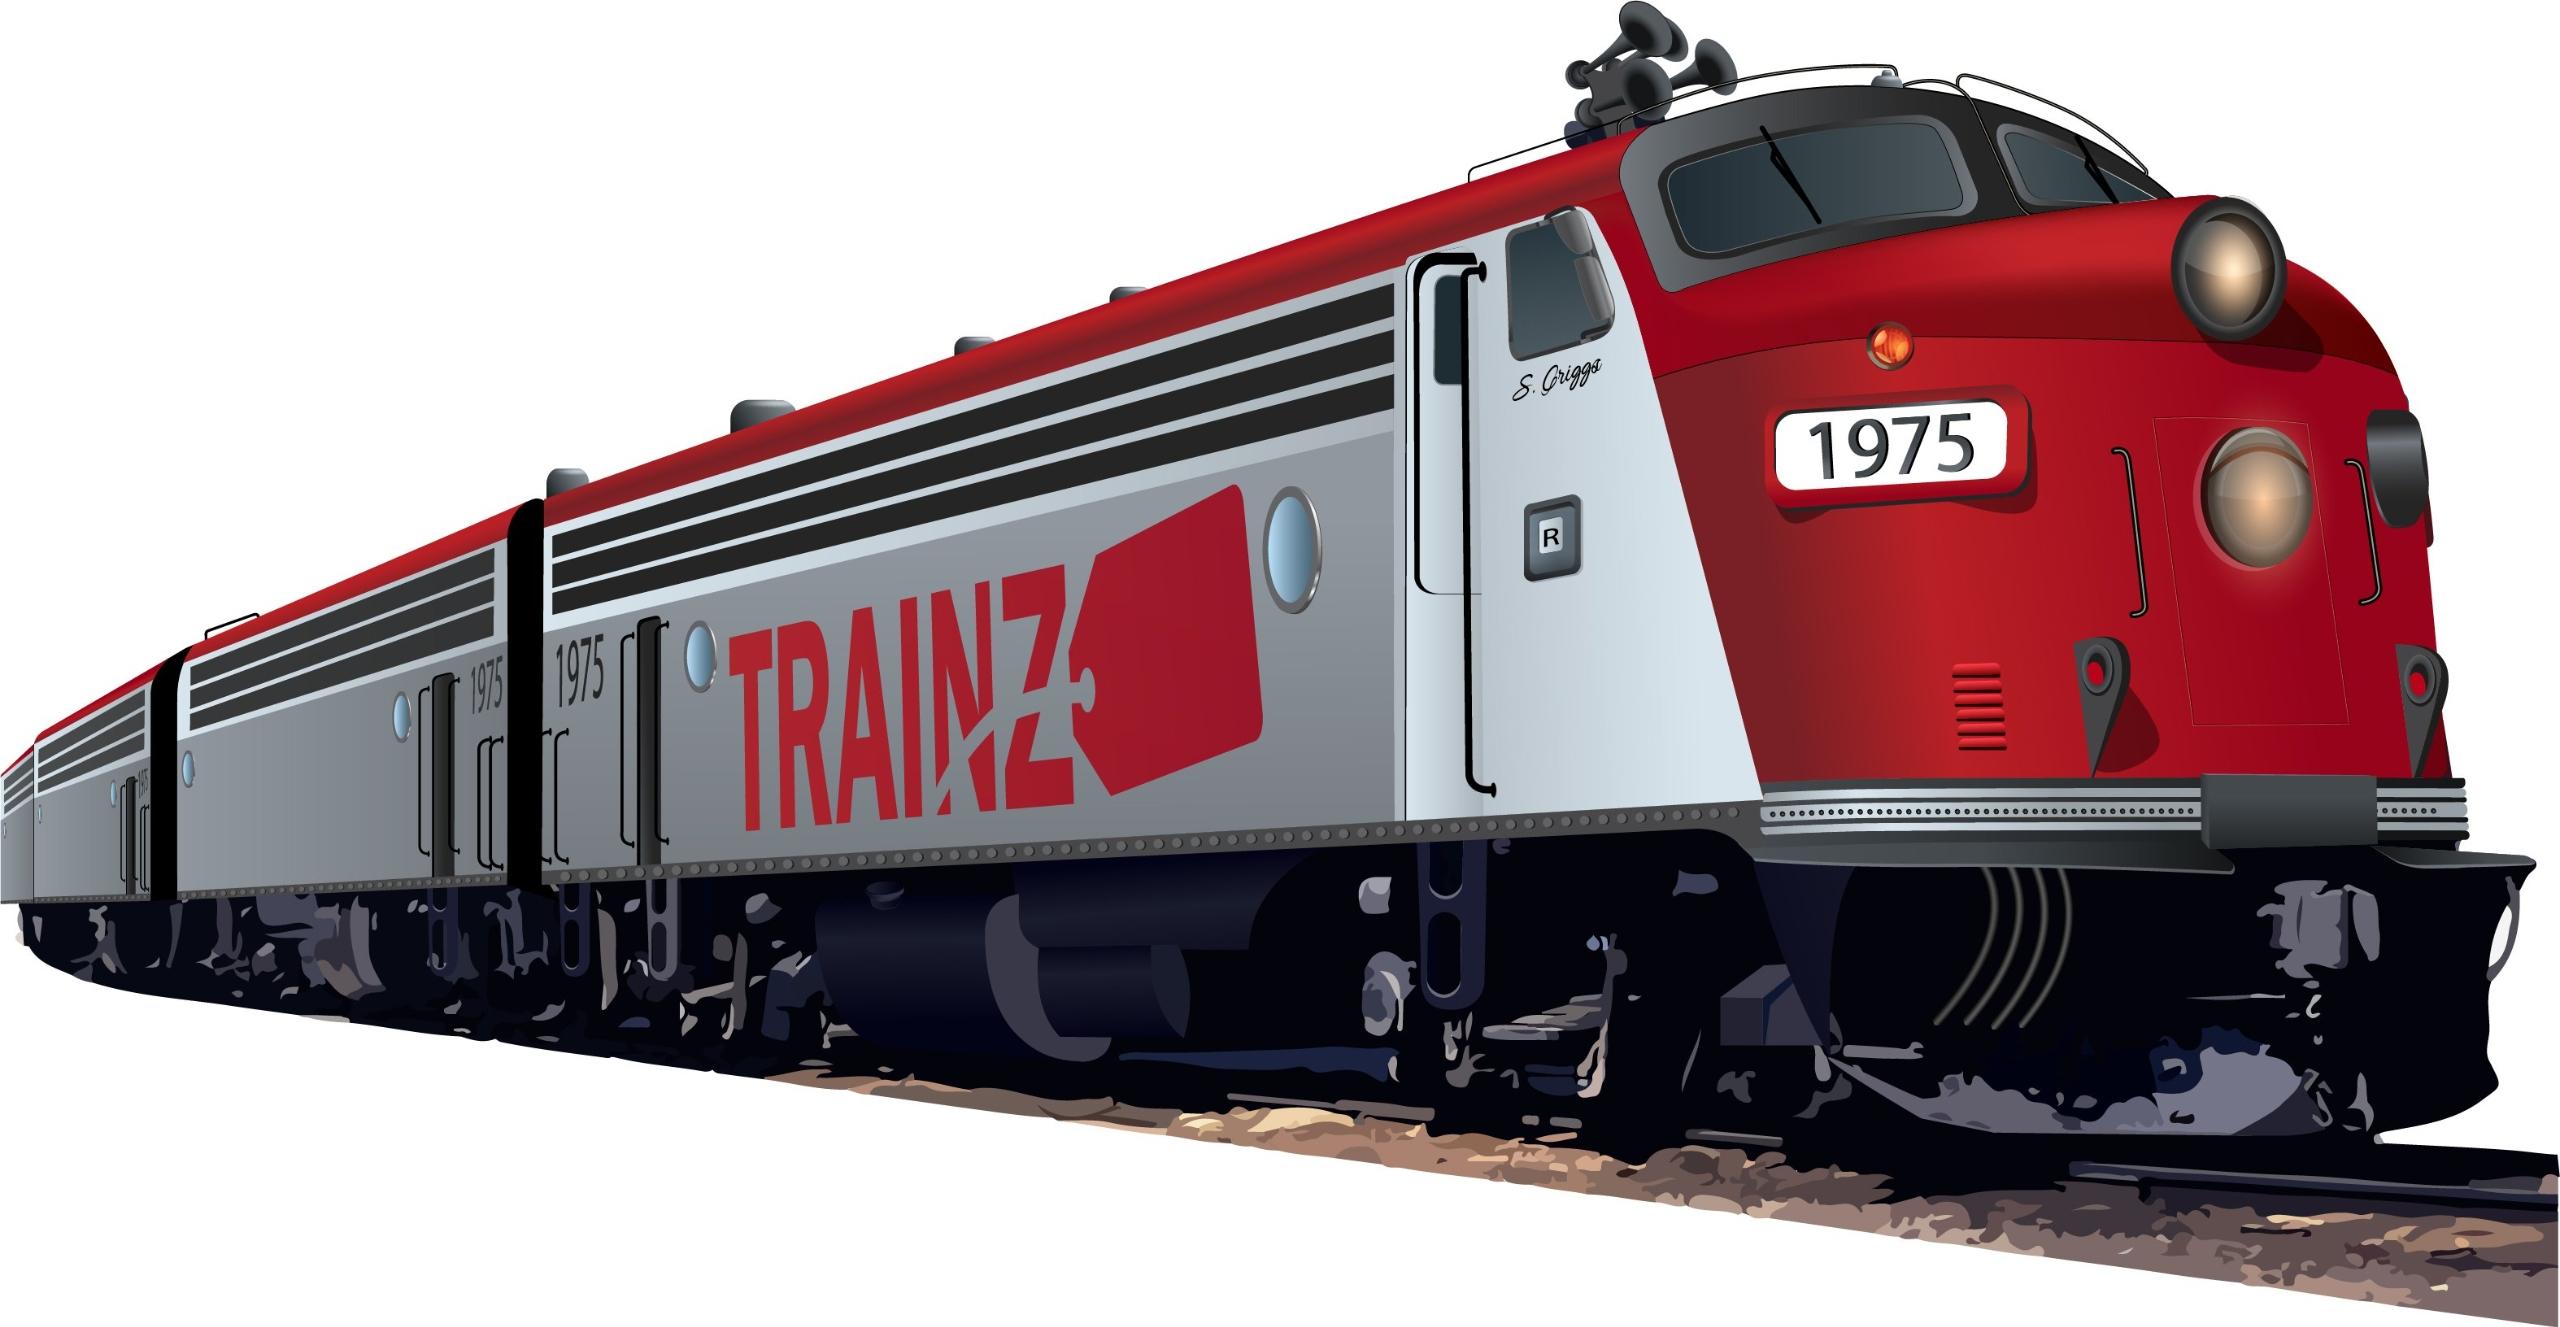 Buy Trainz - Lionel Train arts (@trainz111) Cover Image